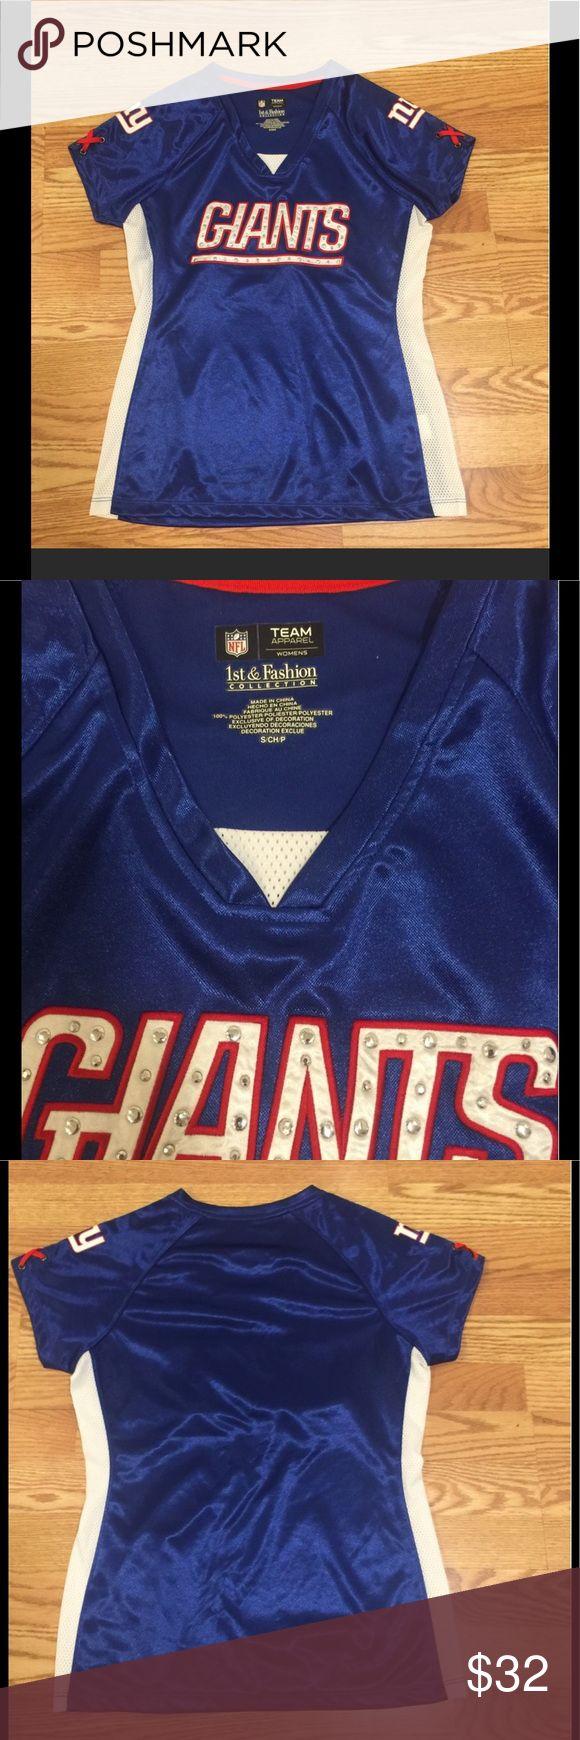 New York Giants jersey LN Size S New York Giants jersey. Metal stud embellished. NFL Tops